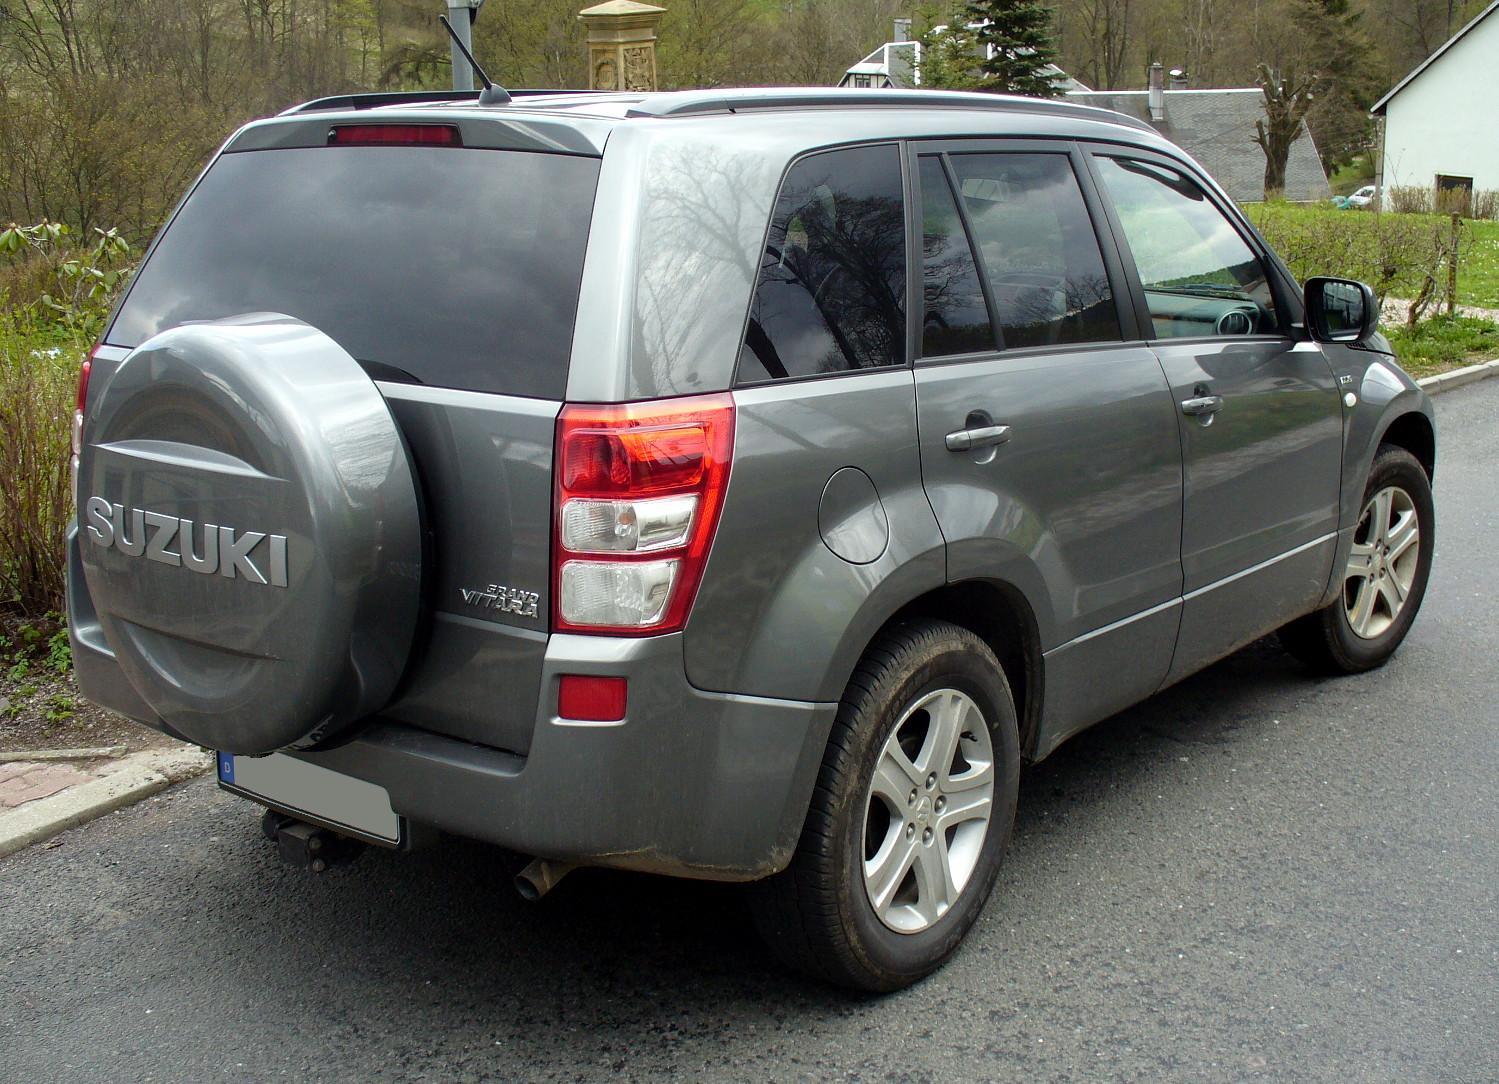 Suzuki grand vitara photo 03